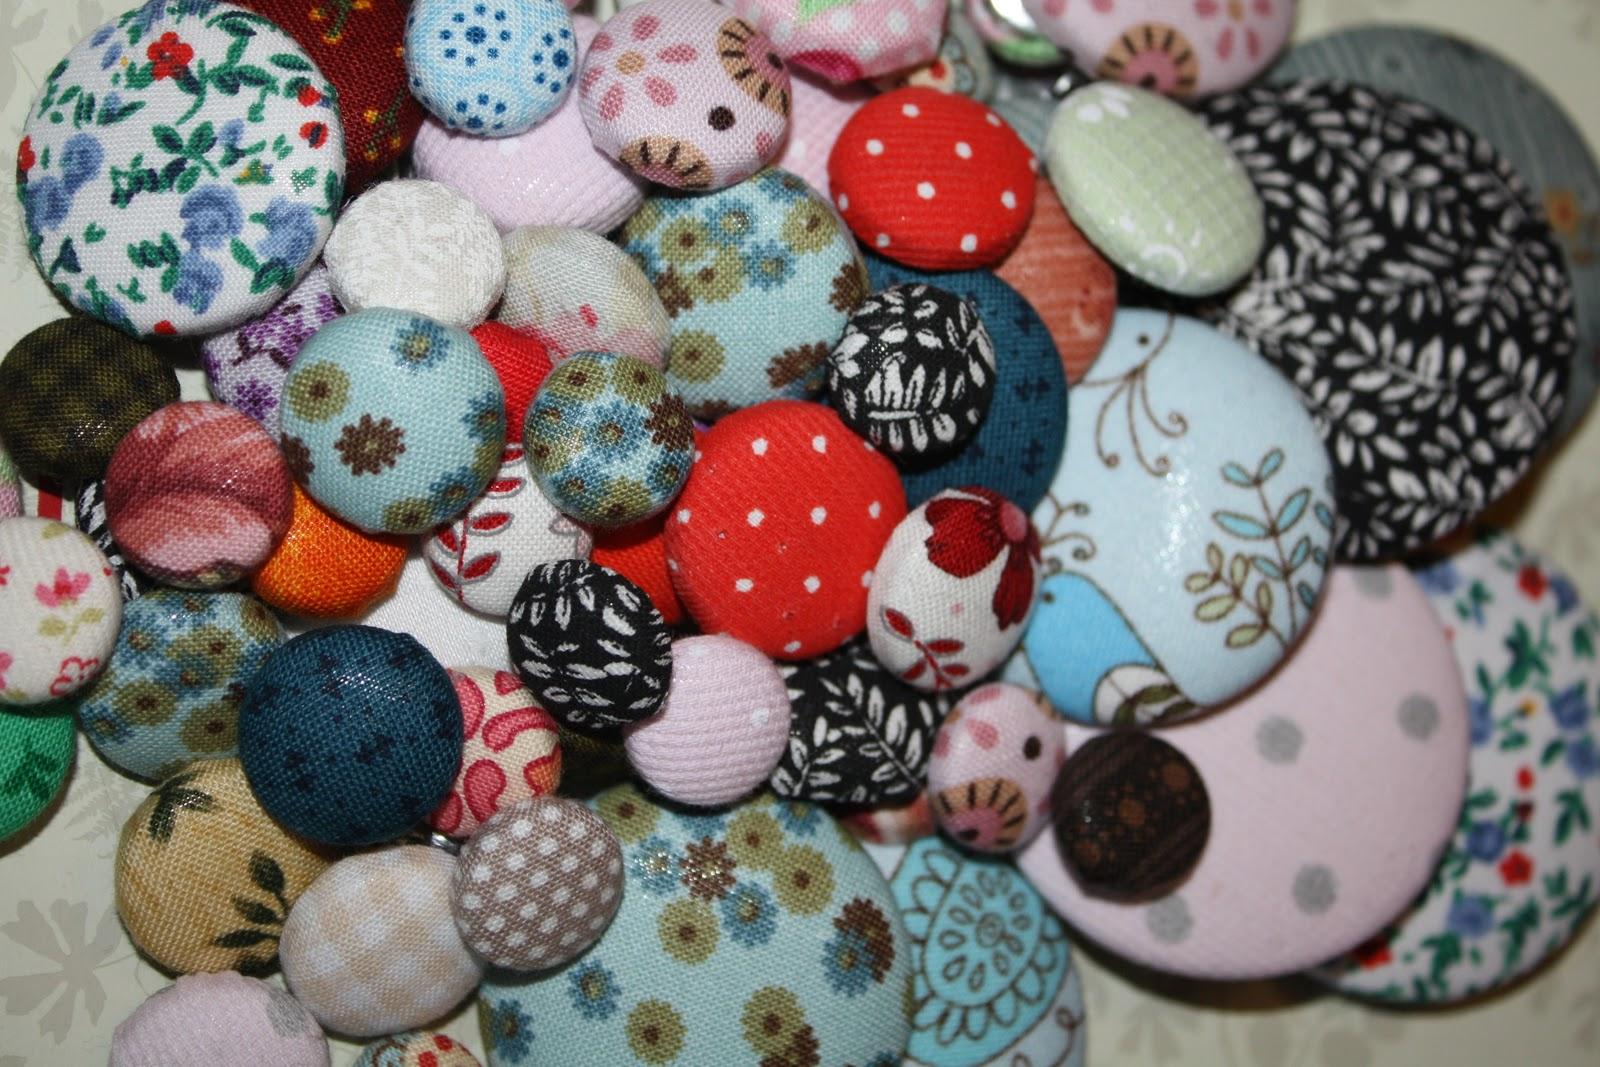 Como forrar botones nosotras mismas - Botones para forrar ...